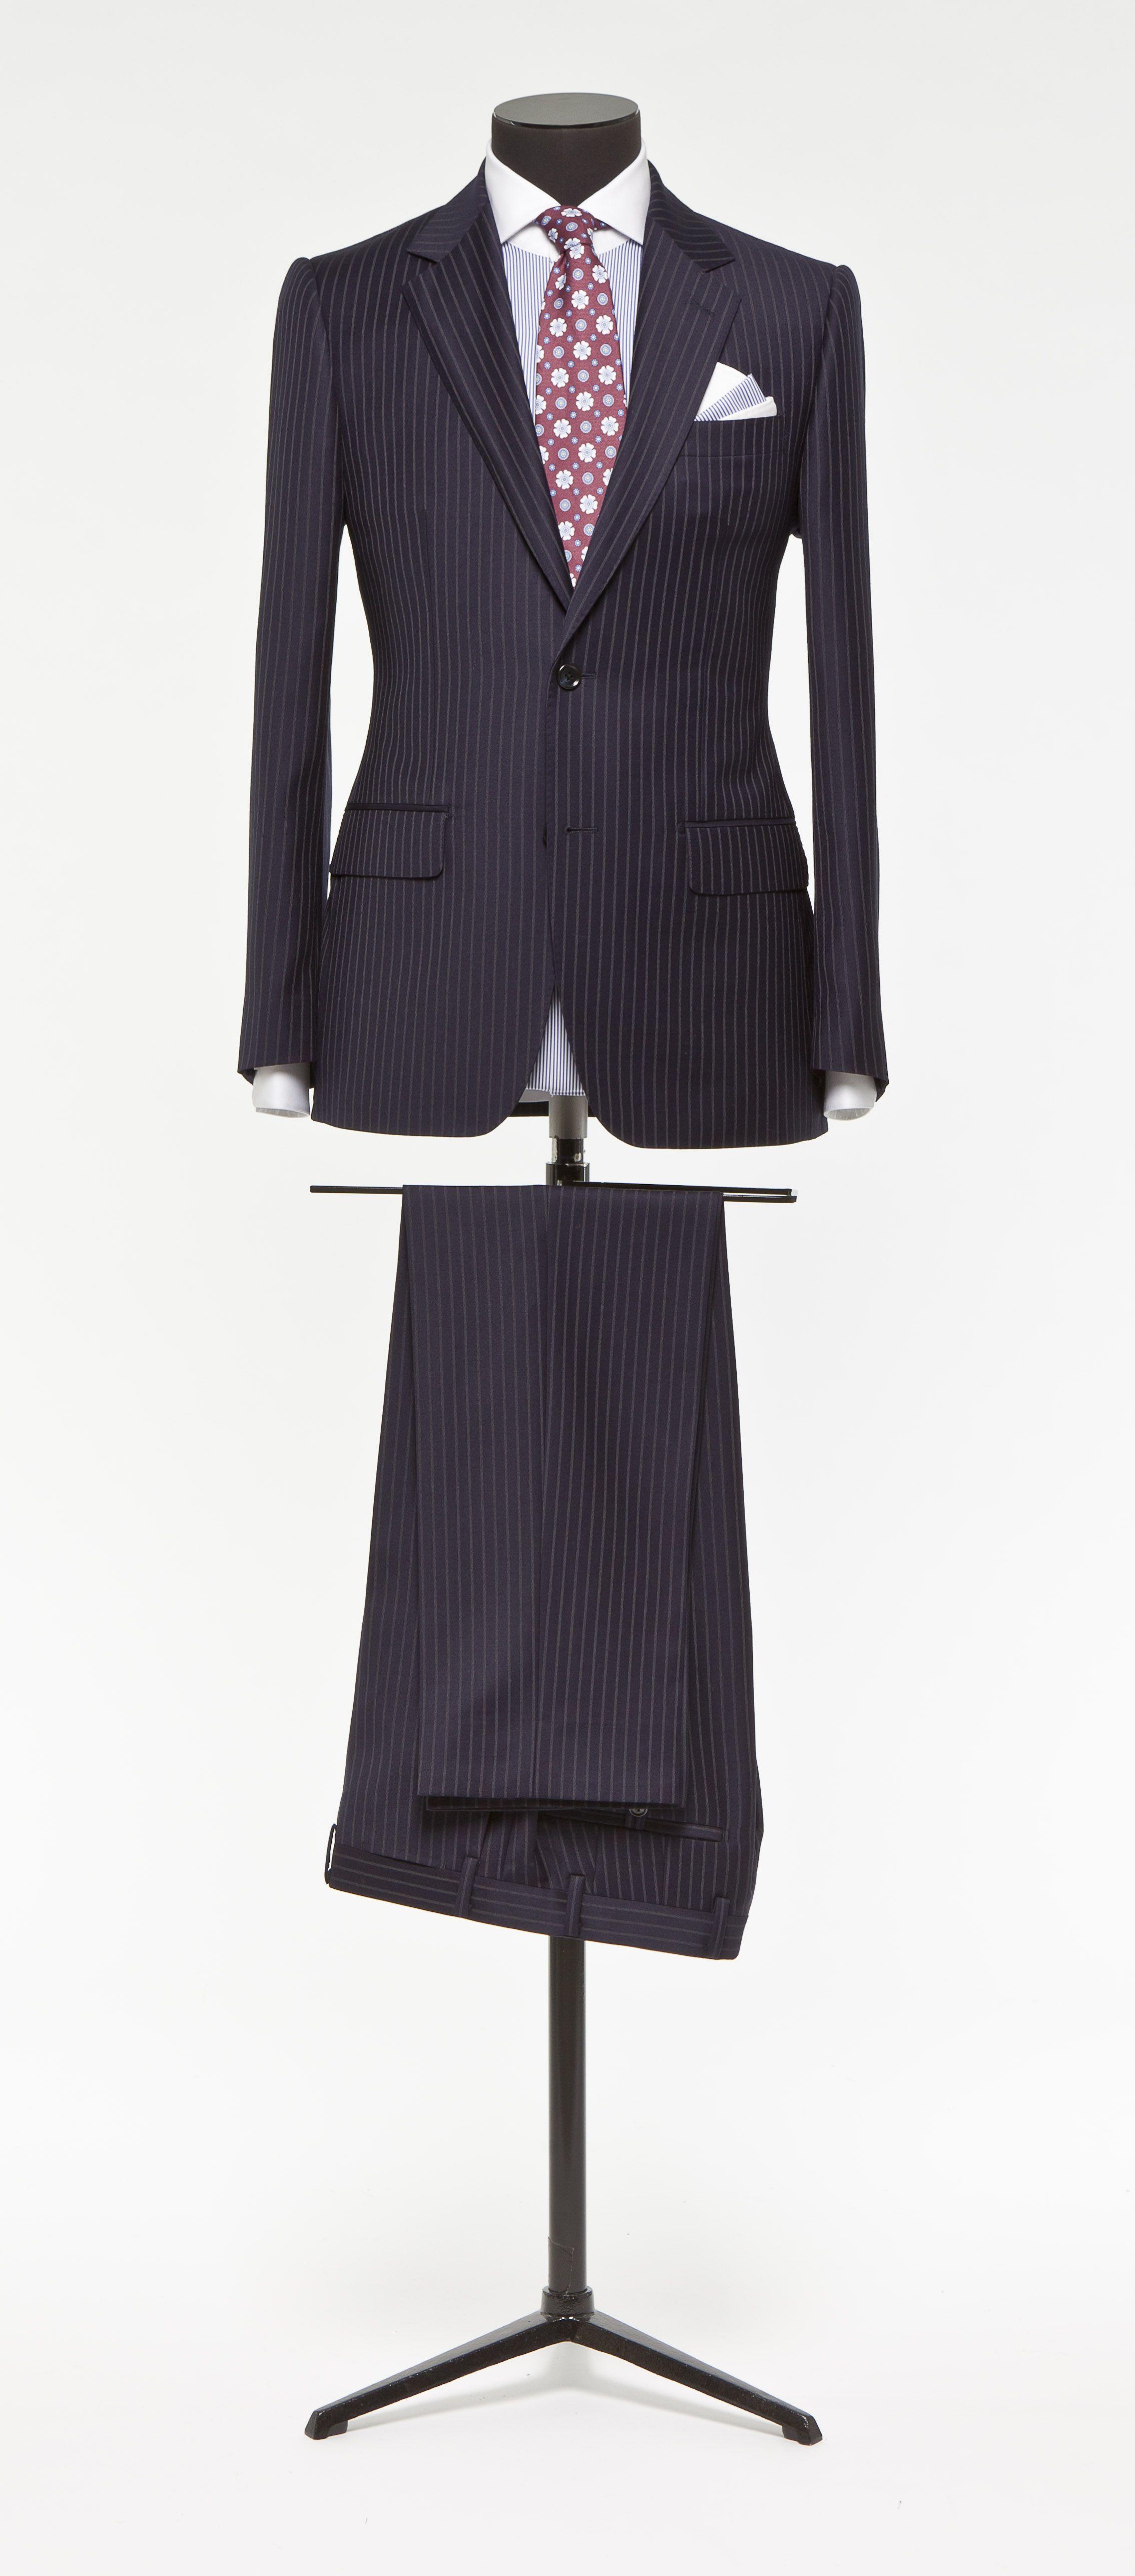 Blue suit Stripe grey S120 http://www.tailormadelondon.com/shop/tailored-suit-fabric-3870-stripe-blue/